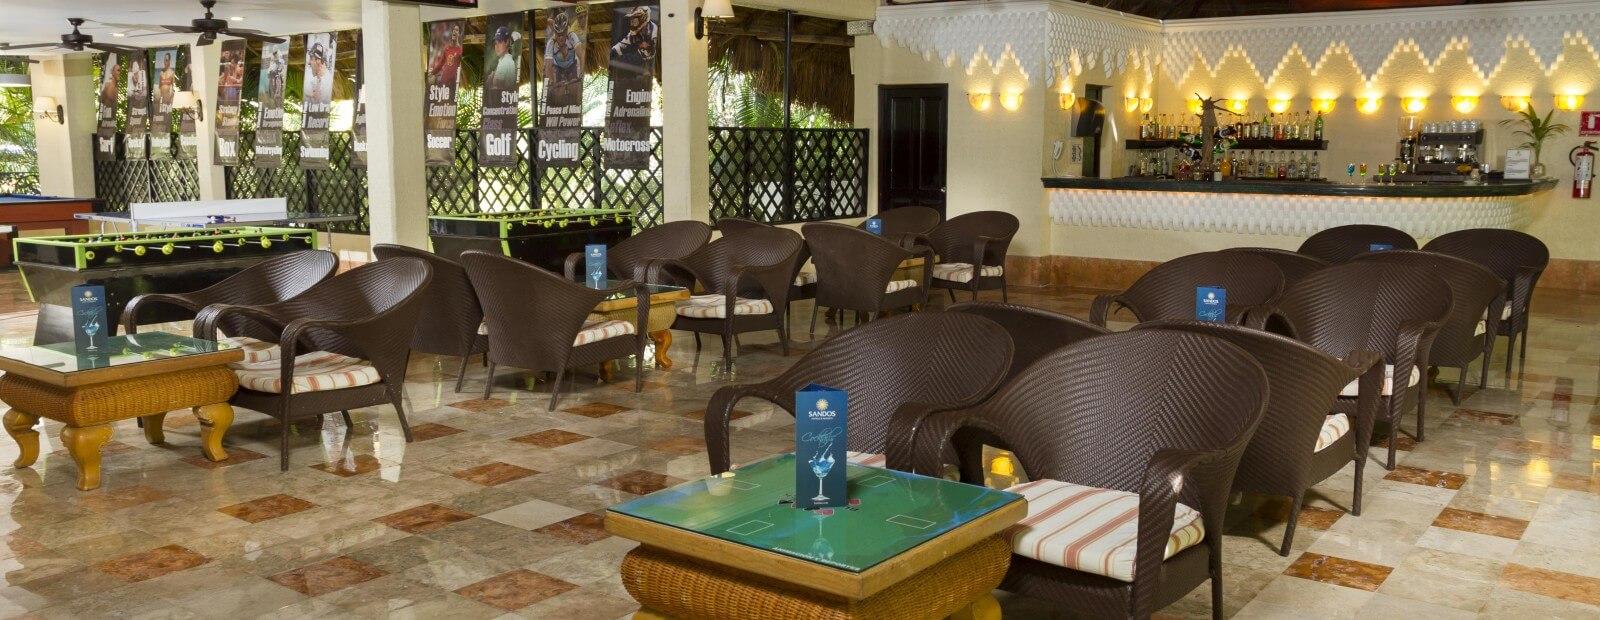 Sports Bar El Manglar